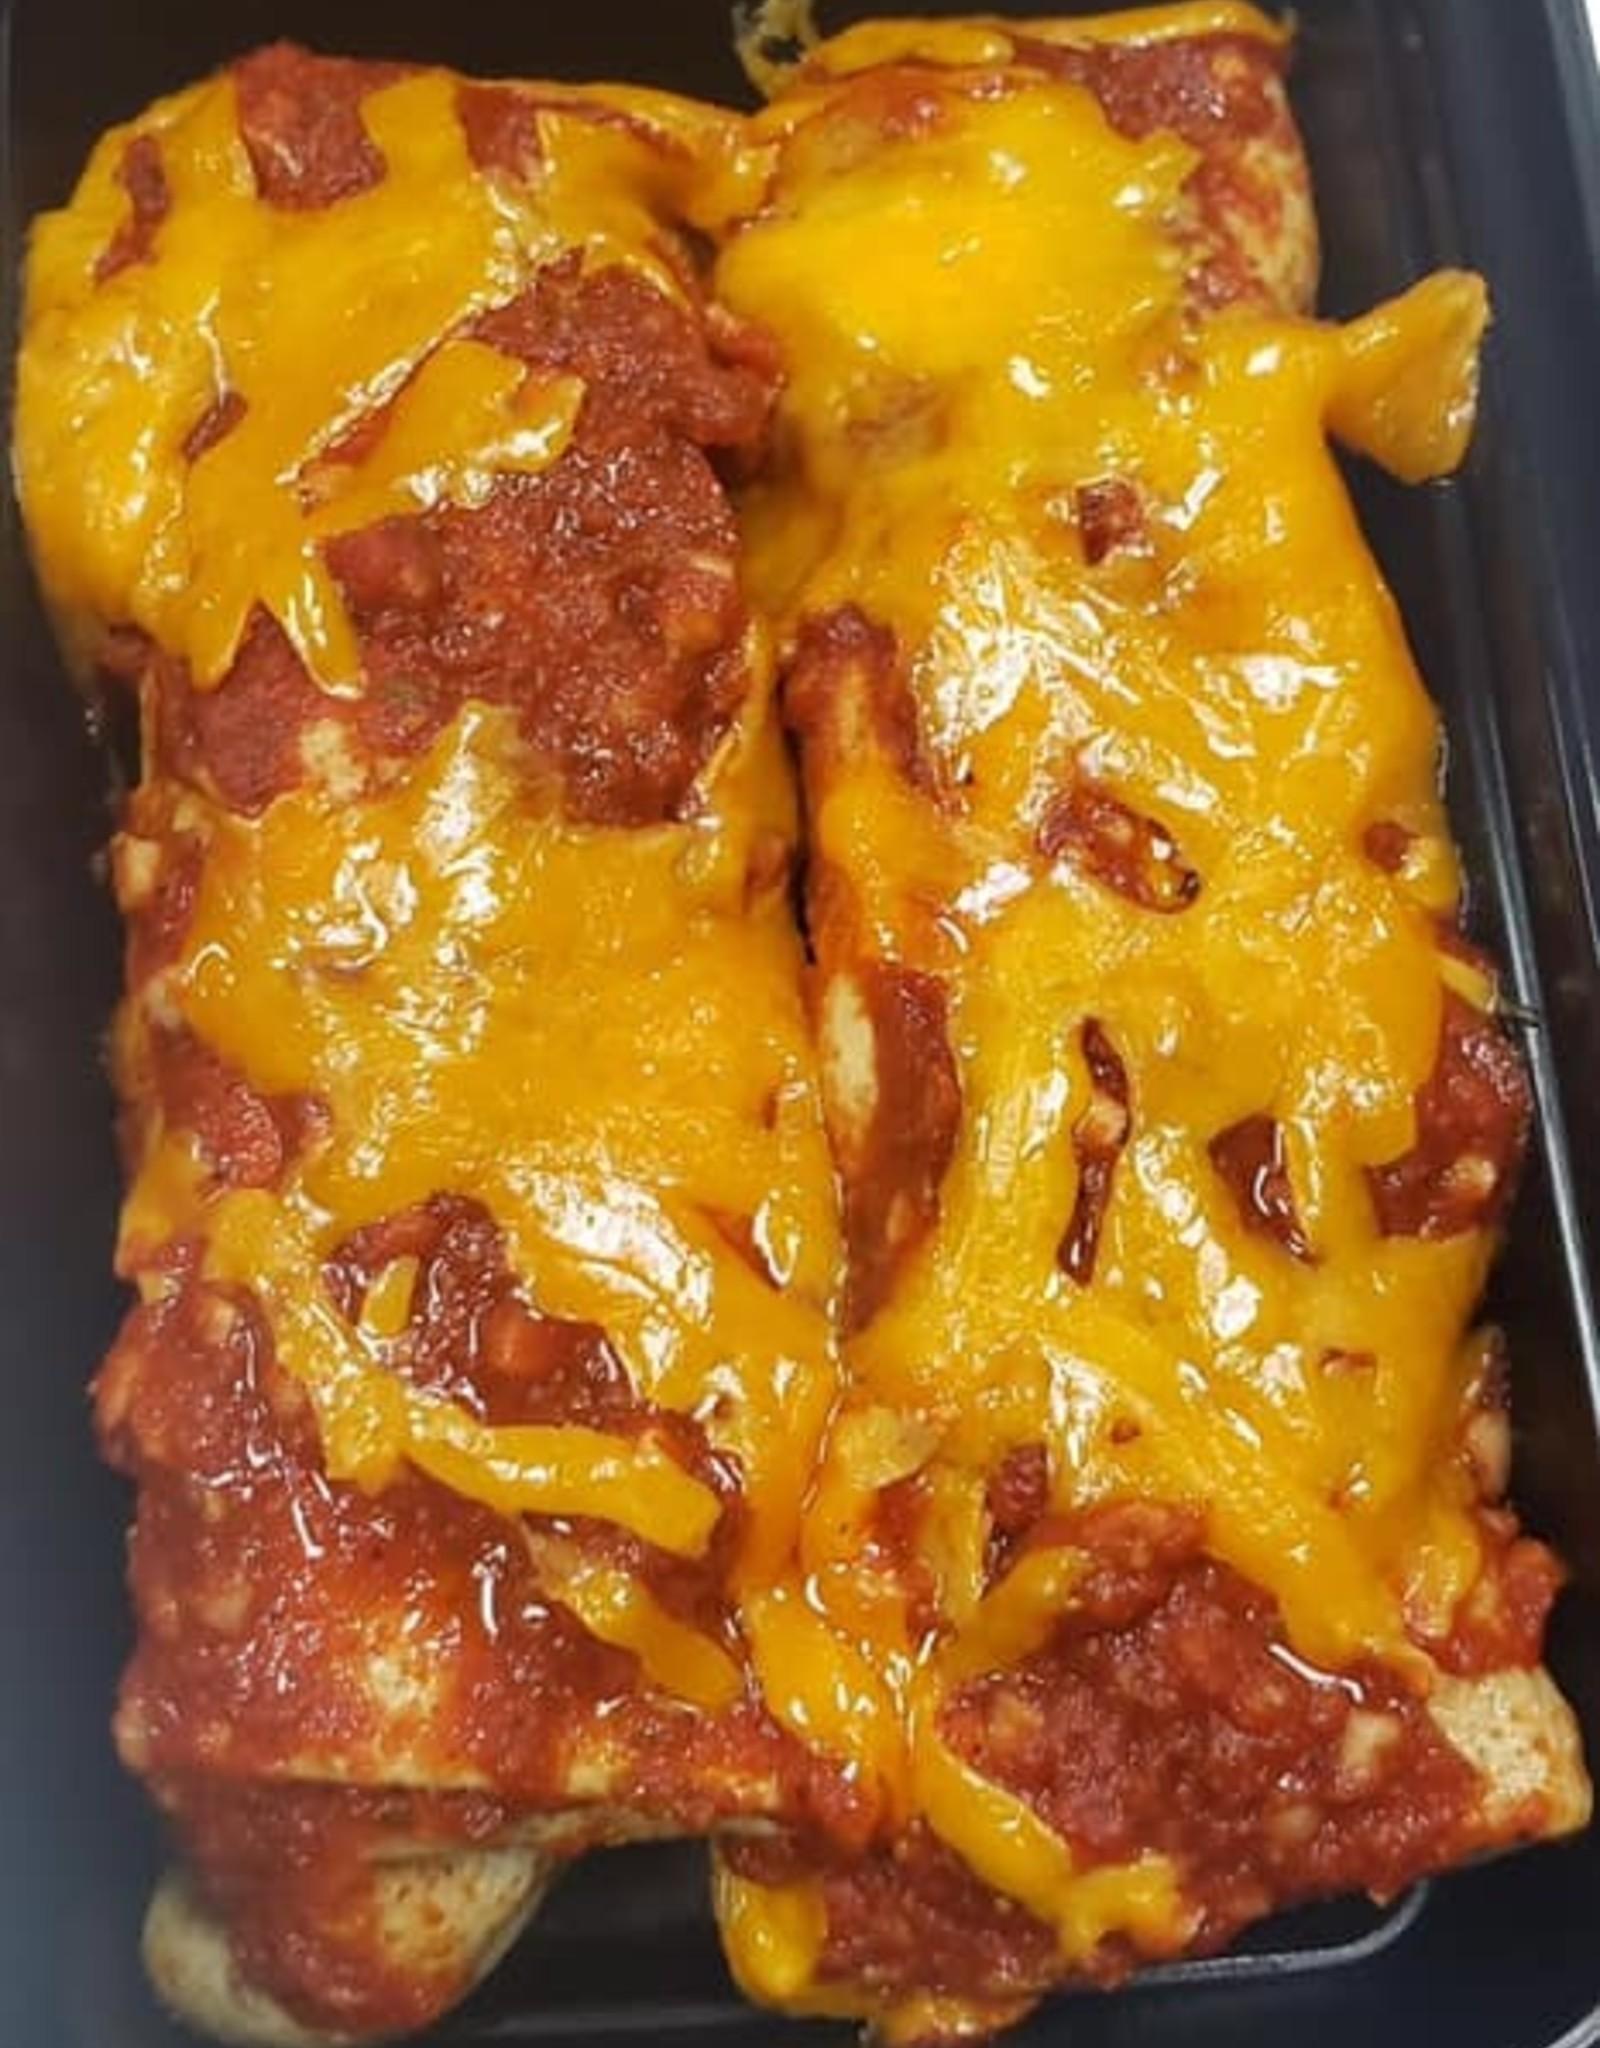 Locally Baked Outlet Locally Baked Outlet - Chicken Enchiladas